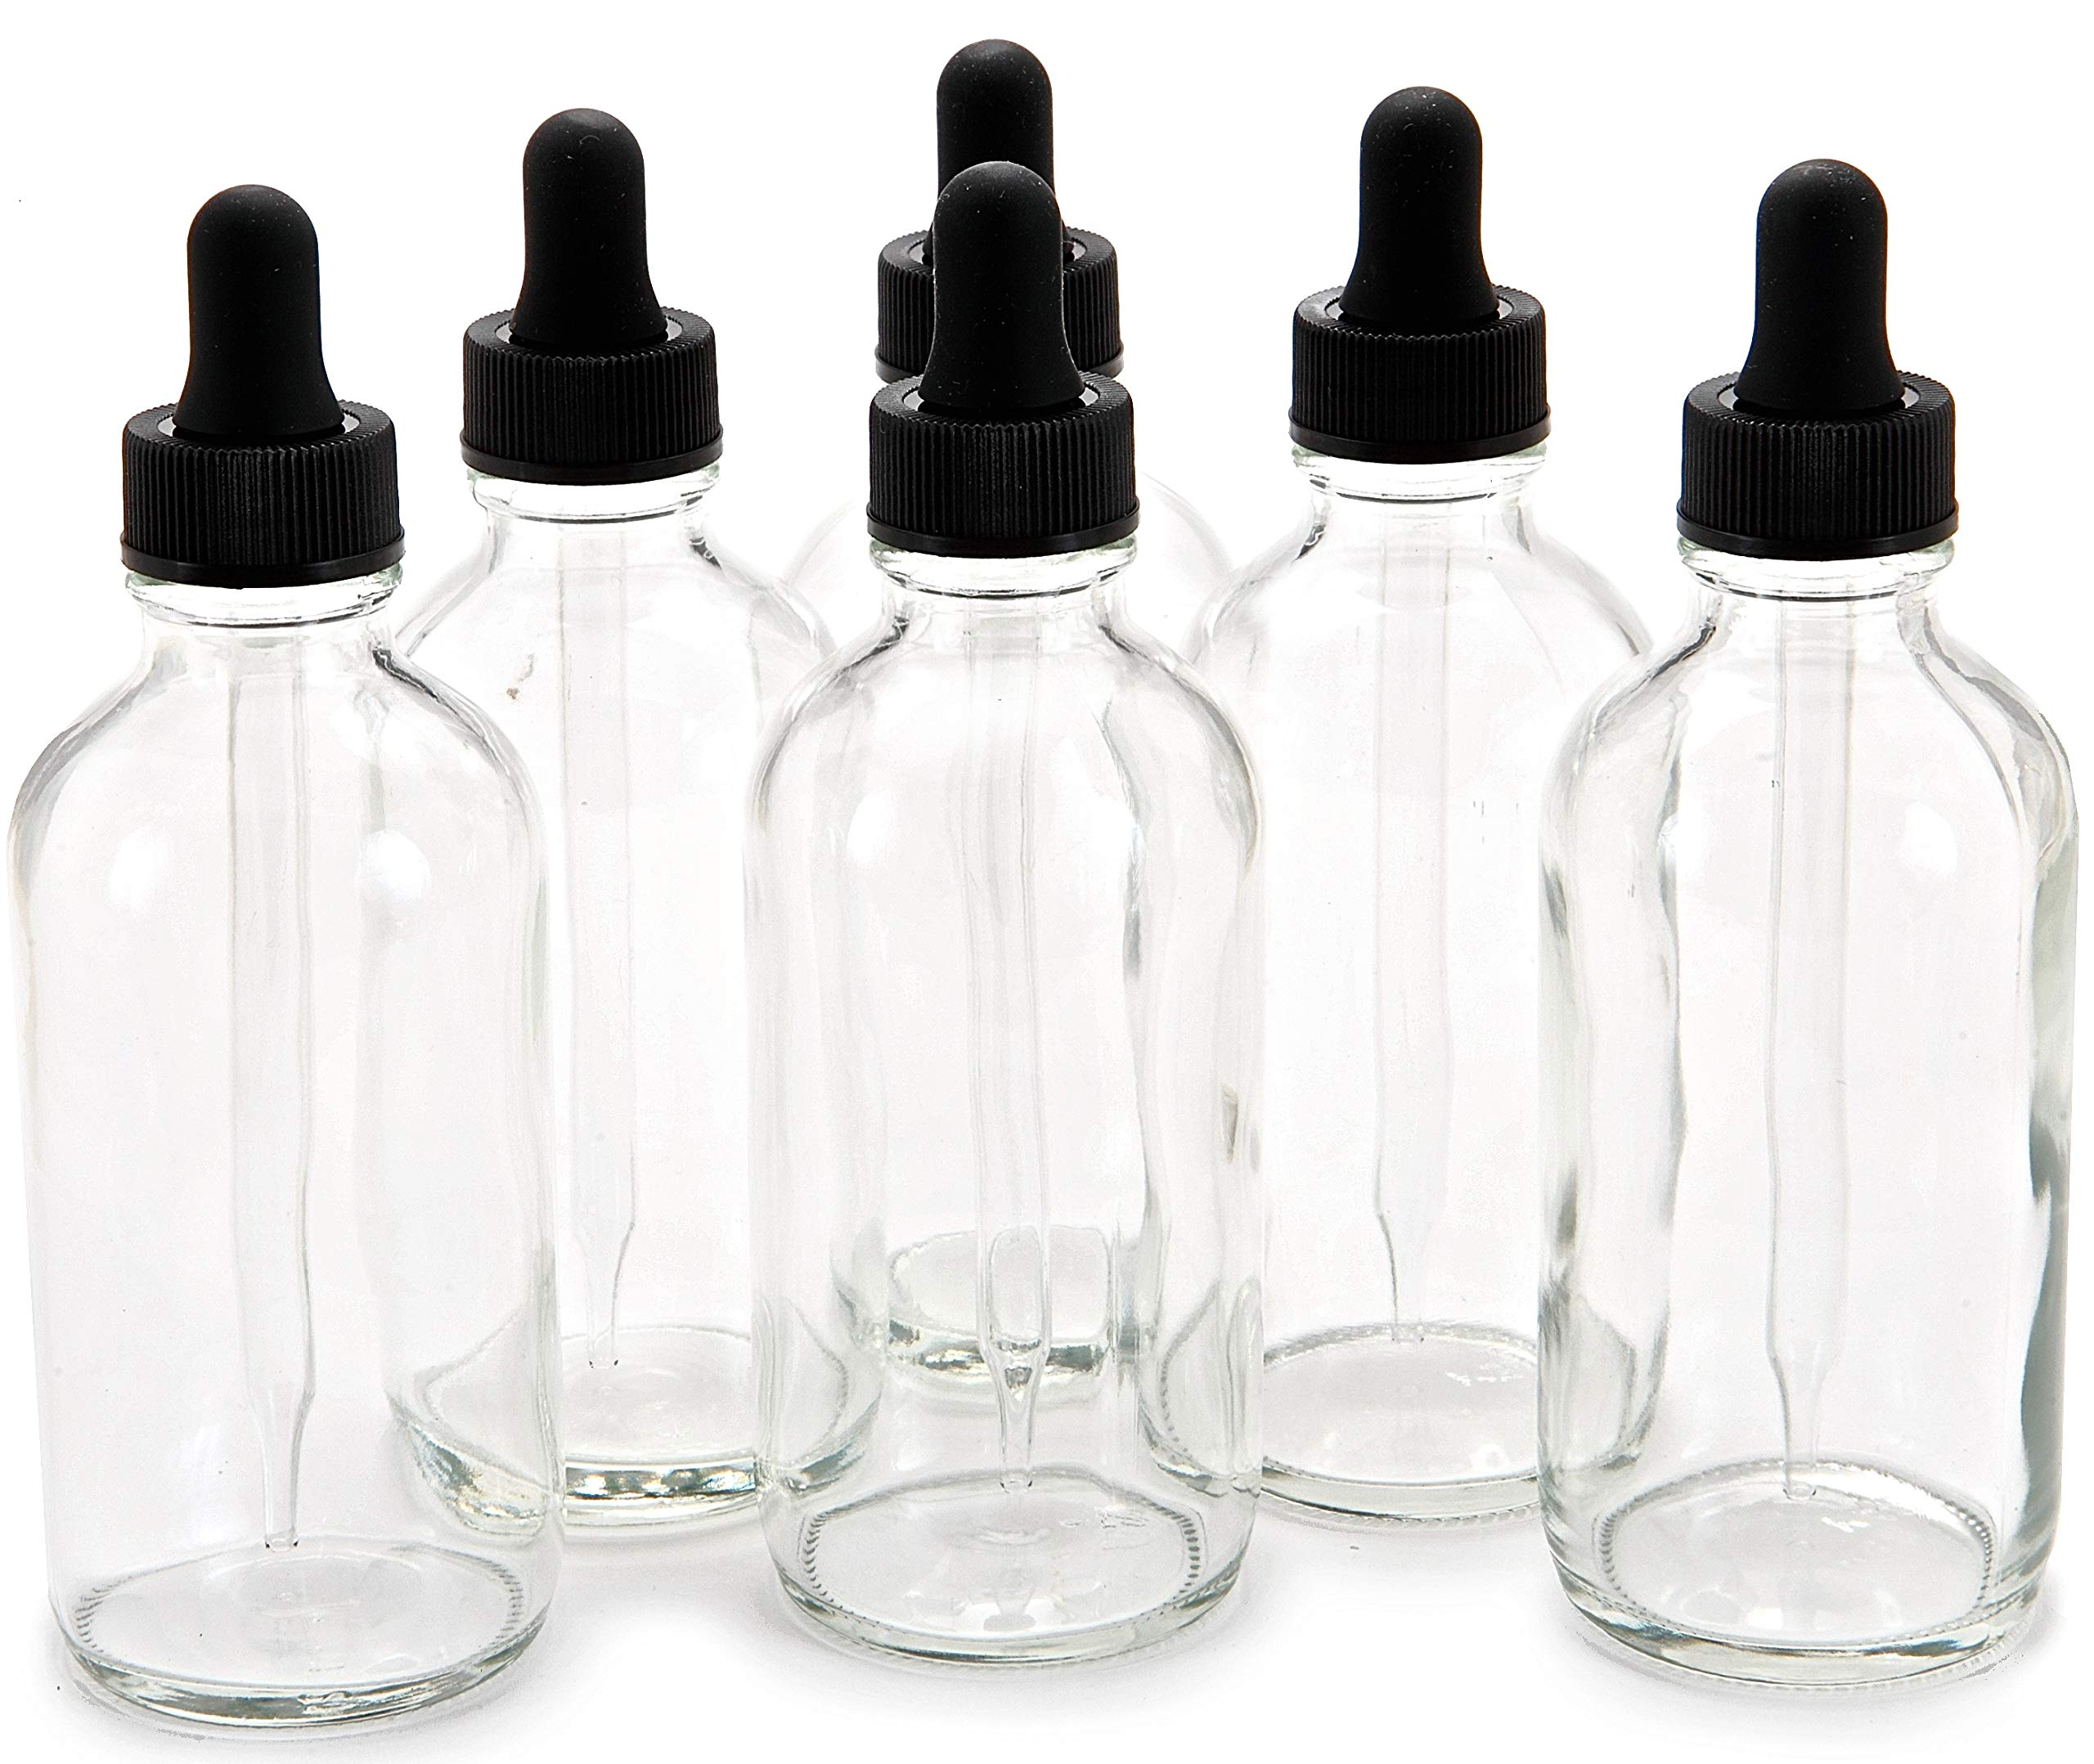 Vivaplex, 6, Clear, 4 oz Glass Bottles, with Glass Eye Droppers